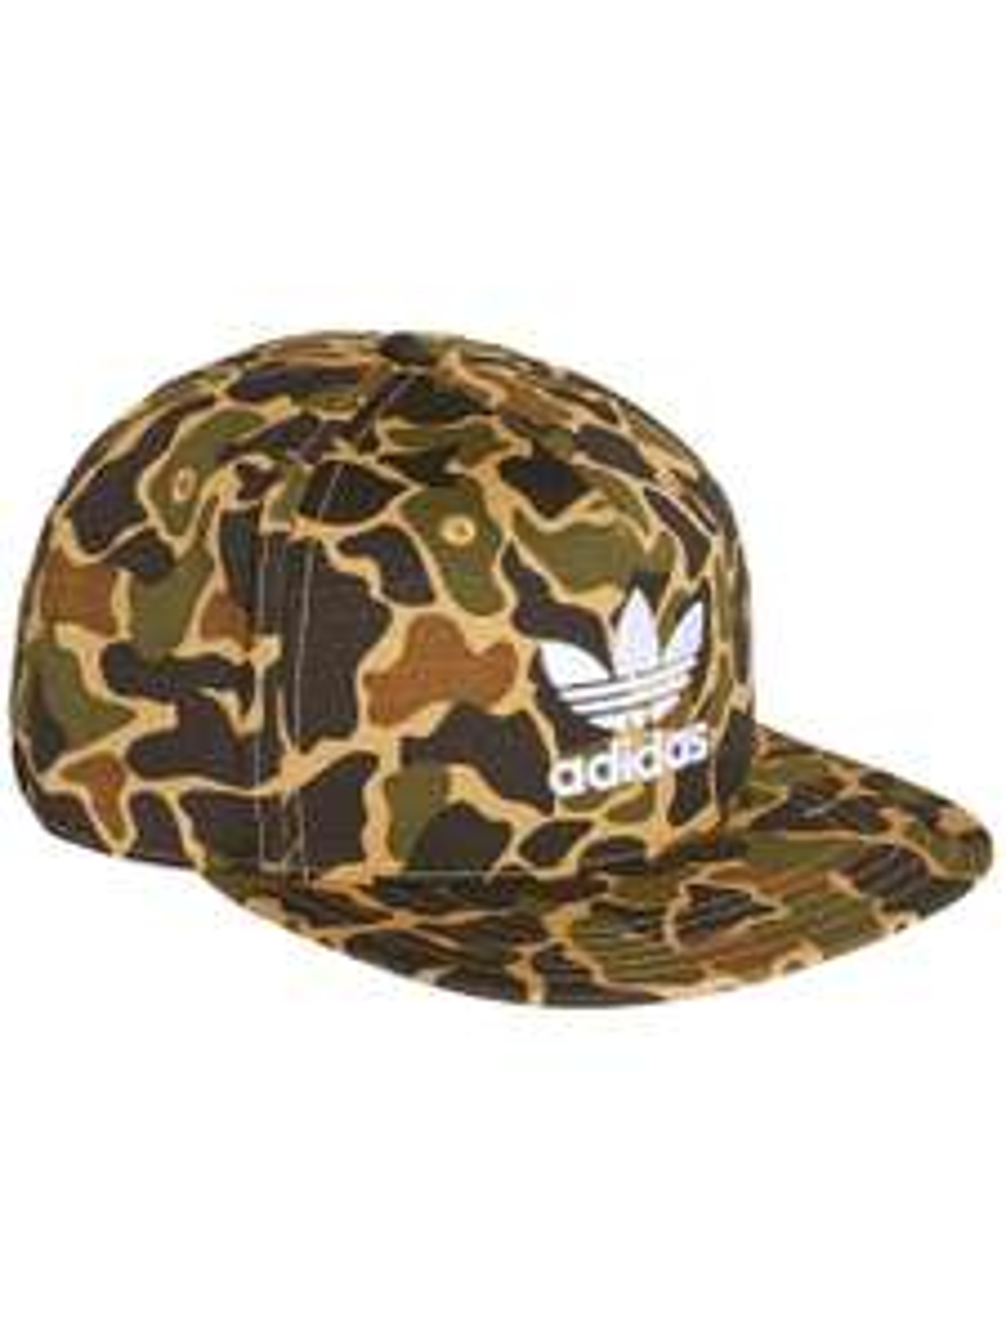 [JD Sports] adidas Snapback - Camo Dark Sahara Cap